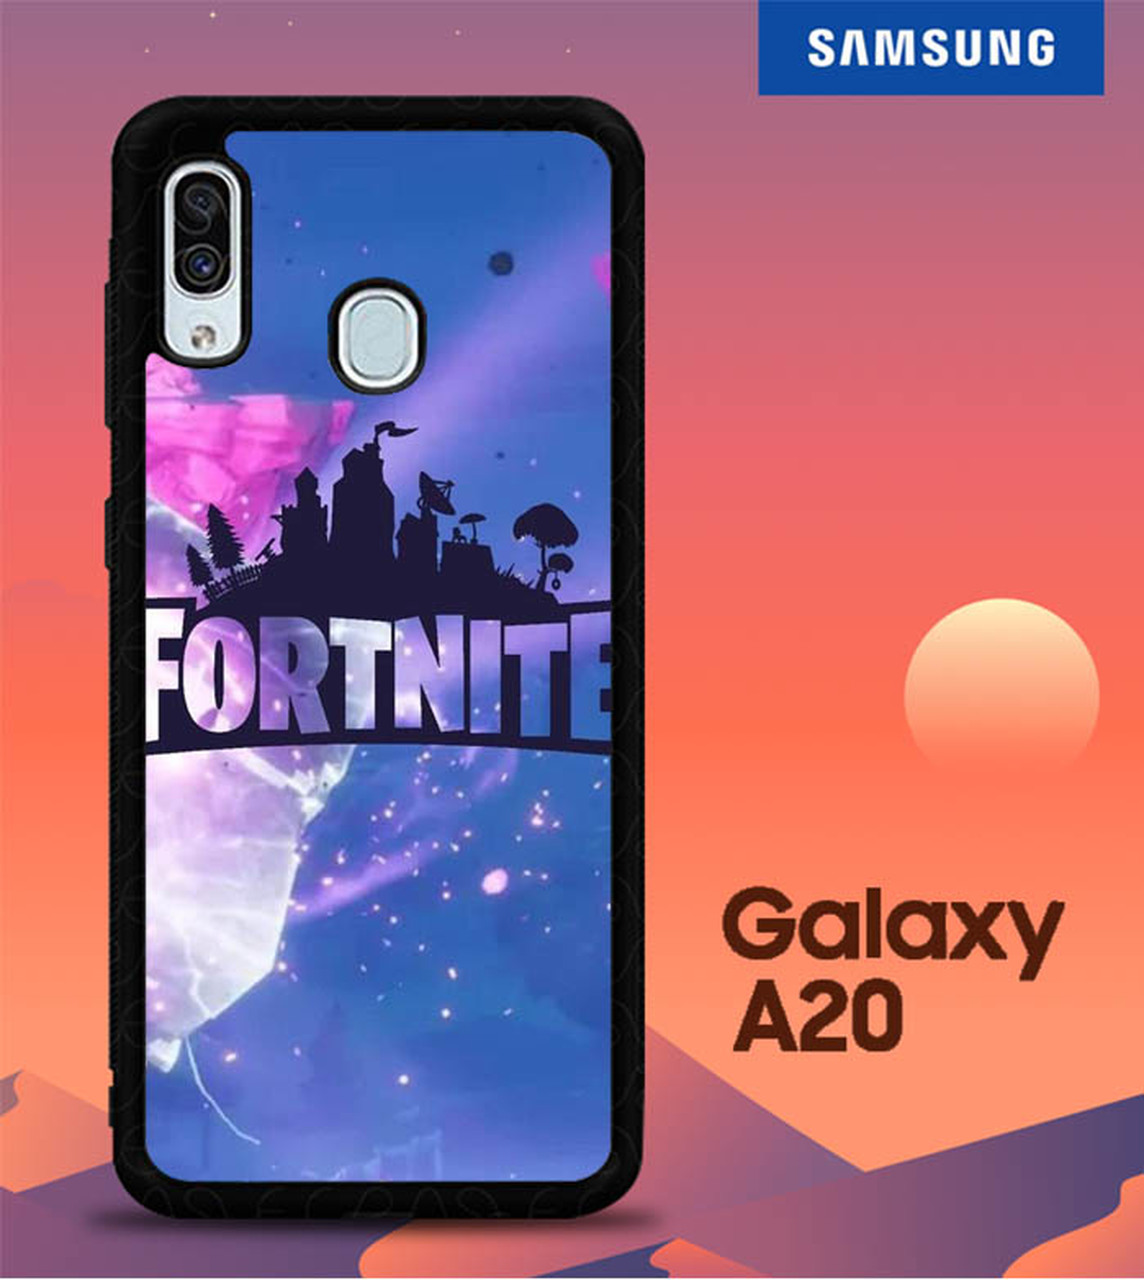 Wallpaper Fortnite FJ0693 Samsung Galaxy A20 Case   Flazzy Store 1144x1280